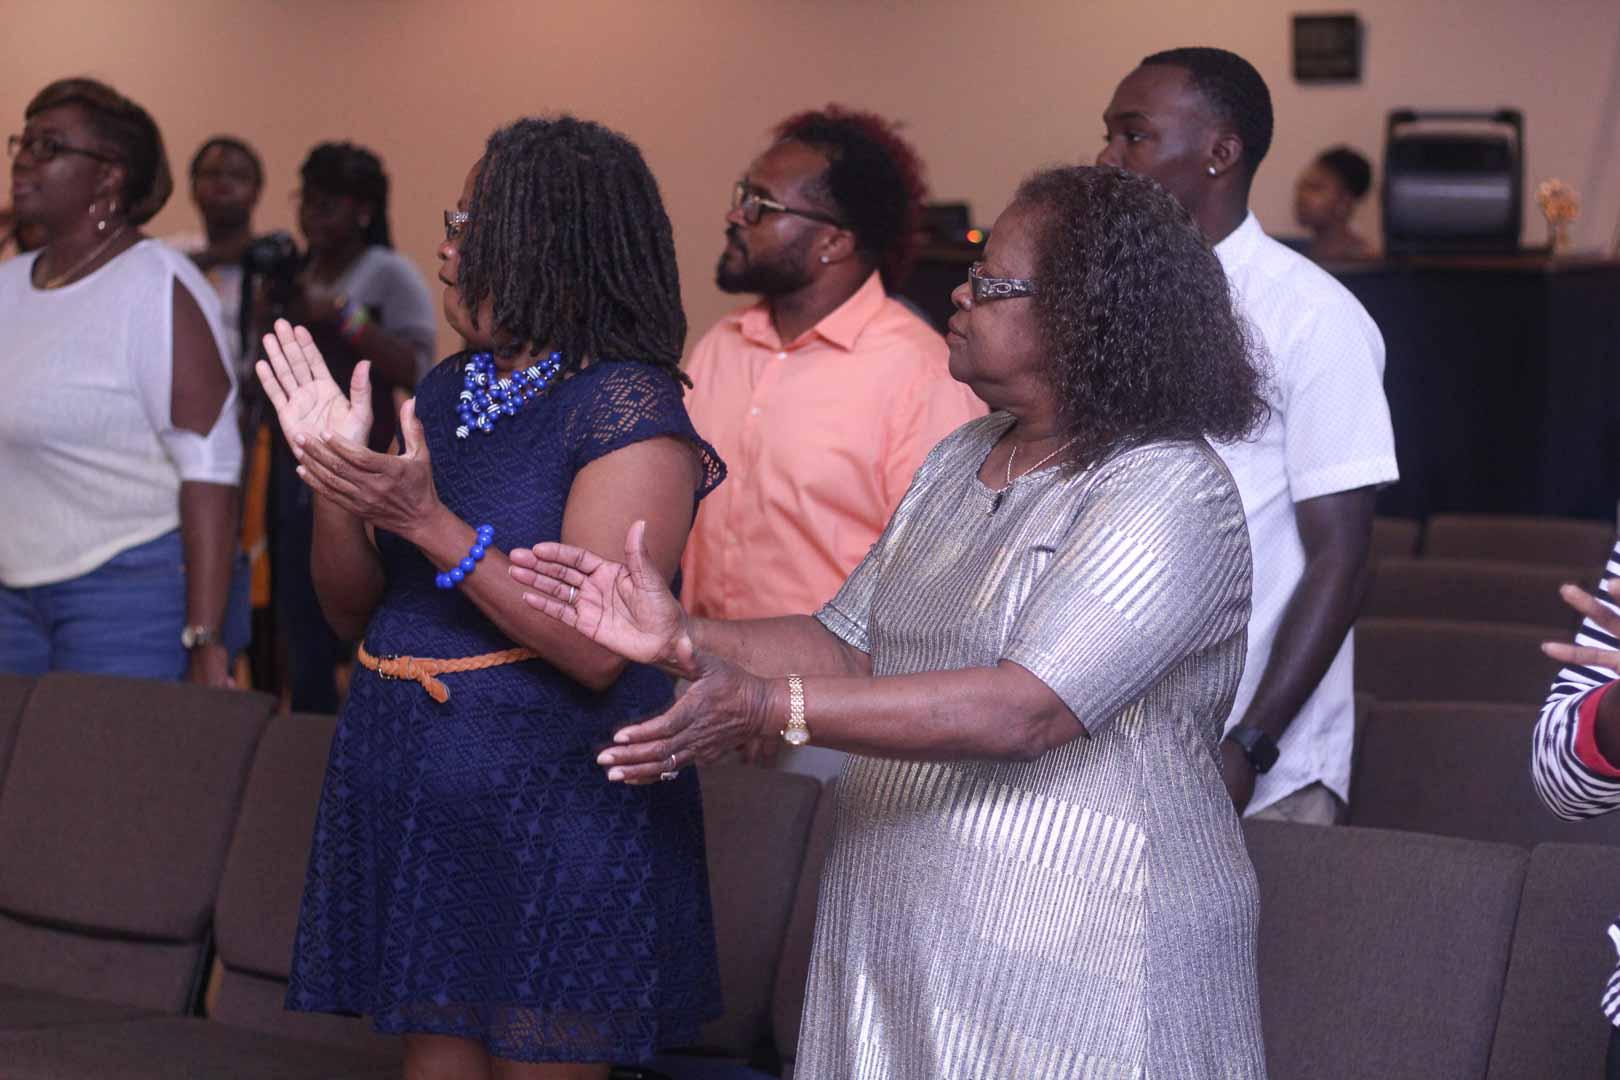 fathershouse-kingdom-ministries-church-in-jacksonville-florida0015